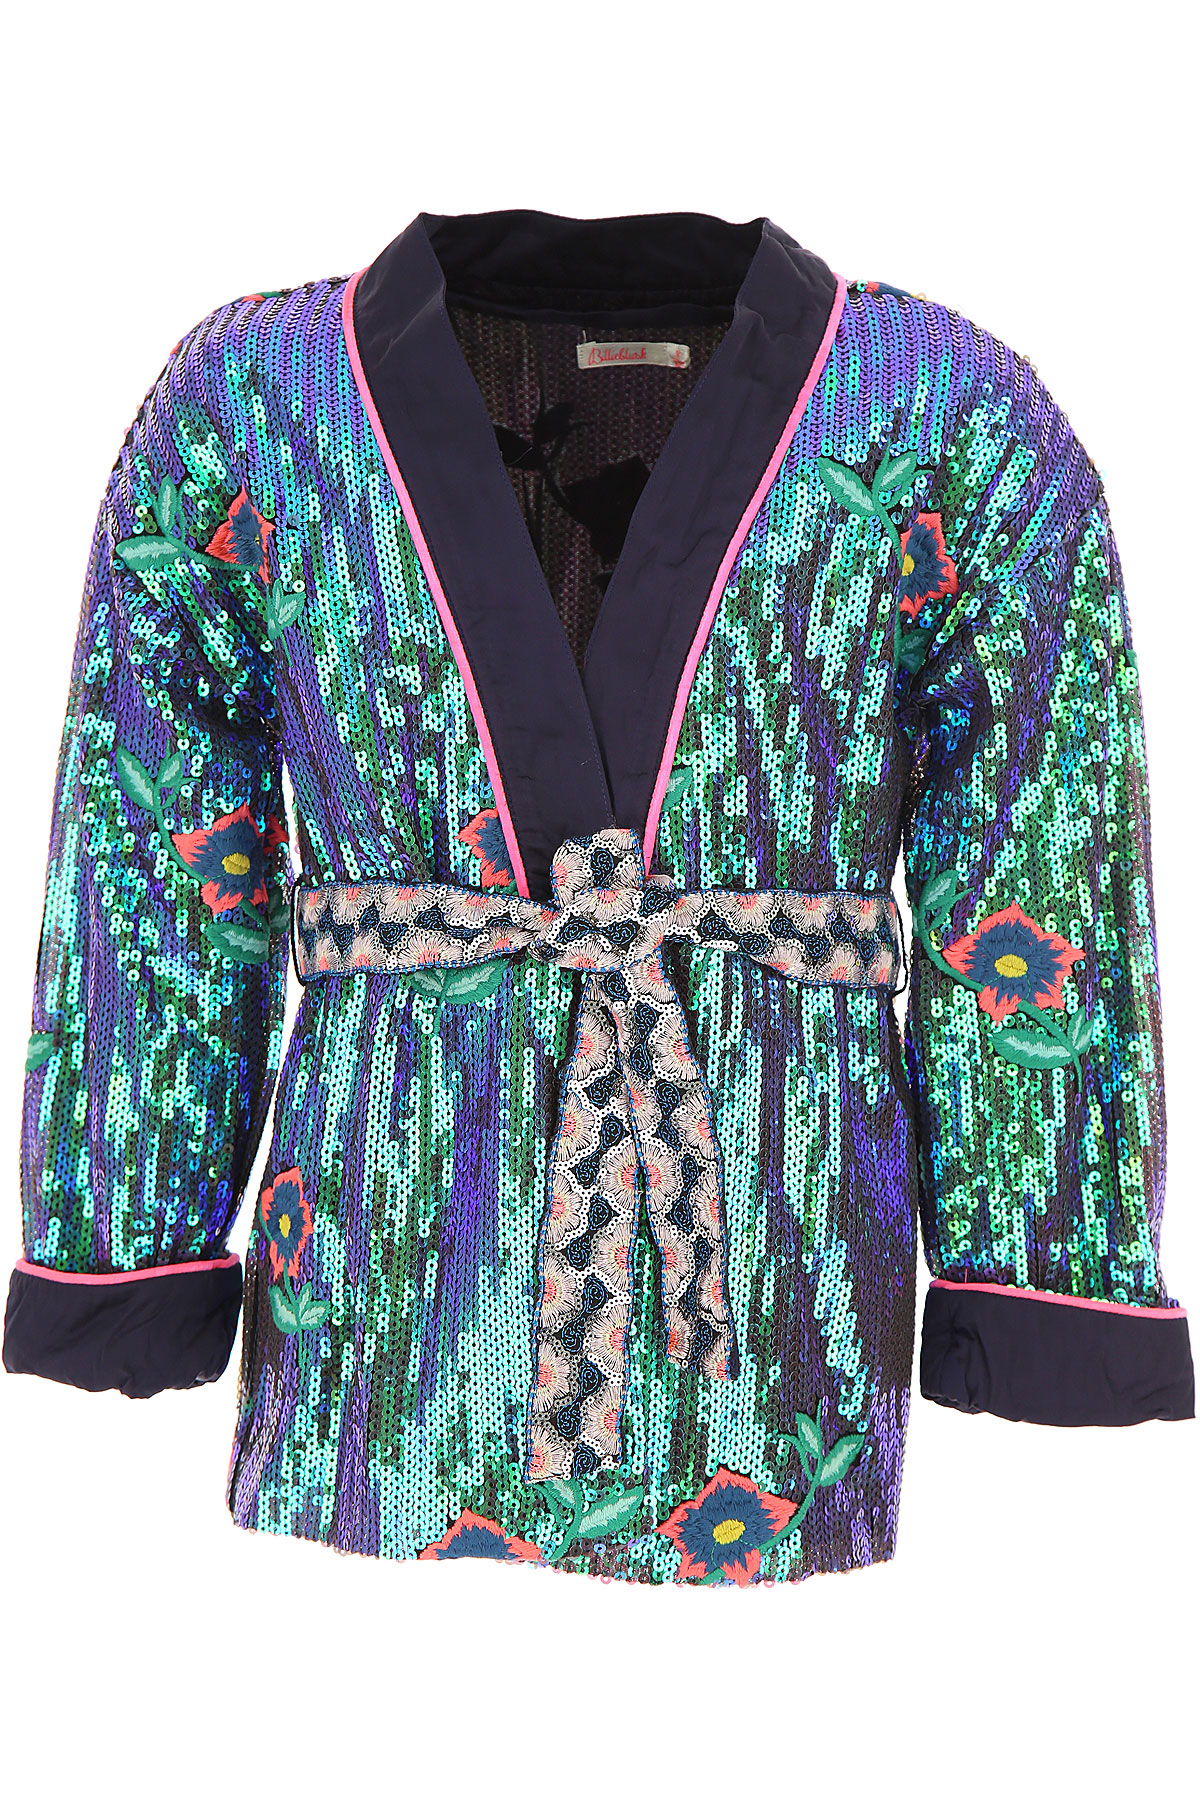 Image of Billieblush Kids Jacket for Girls, Blue, polyester, 2017, 6Y 8Y